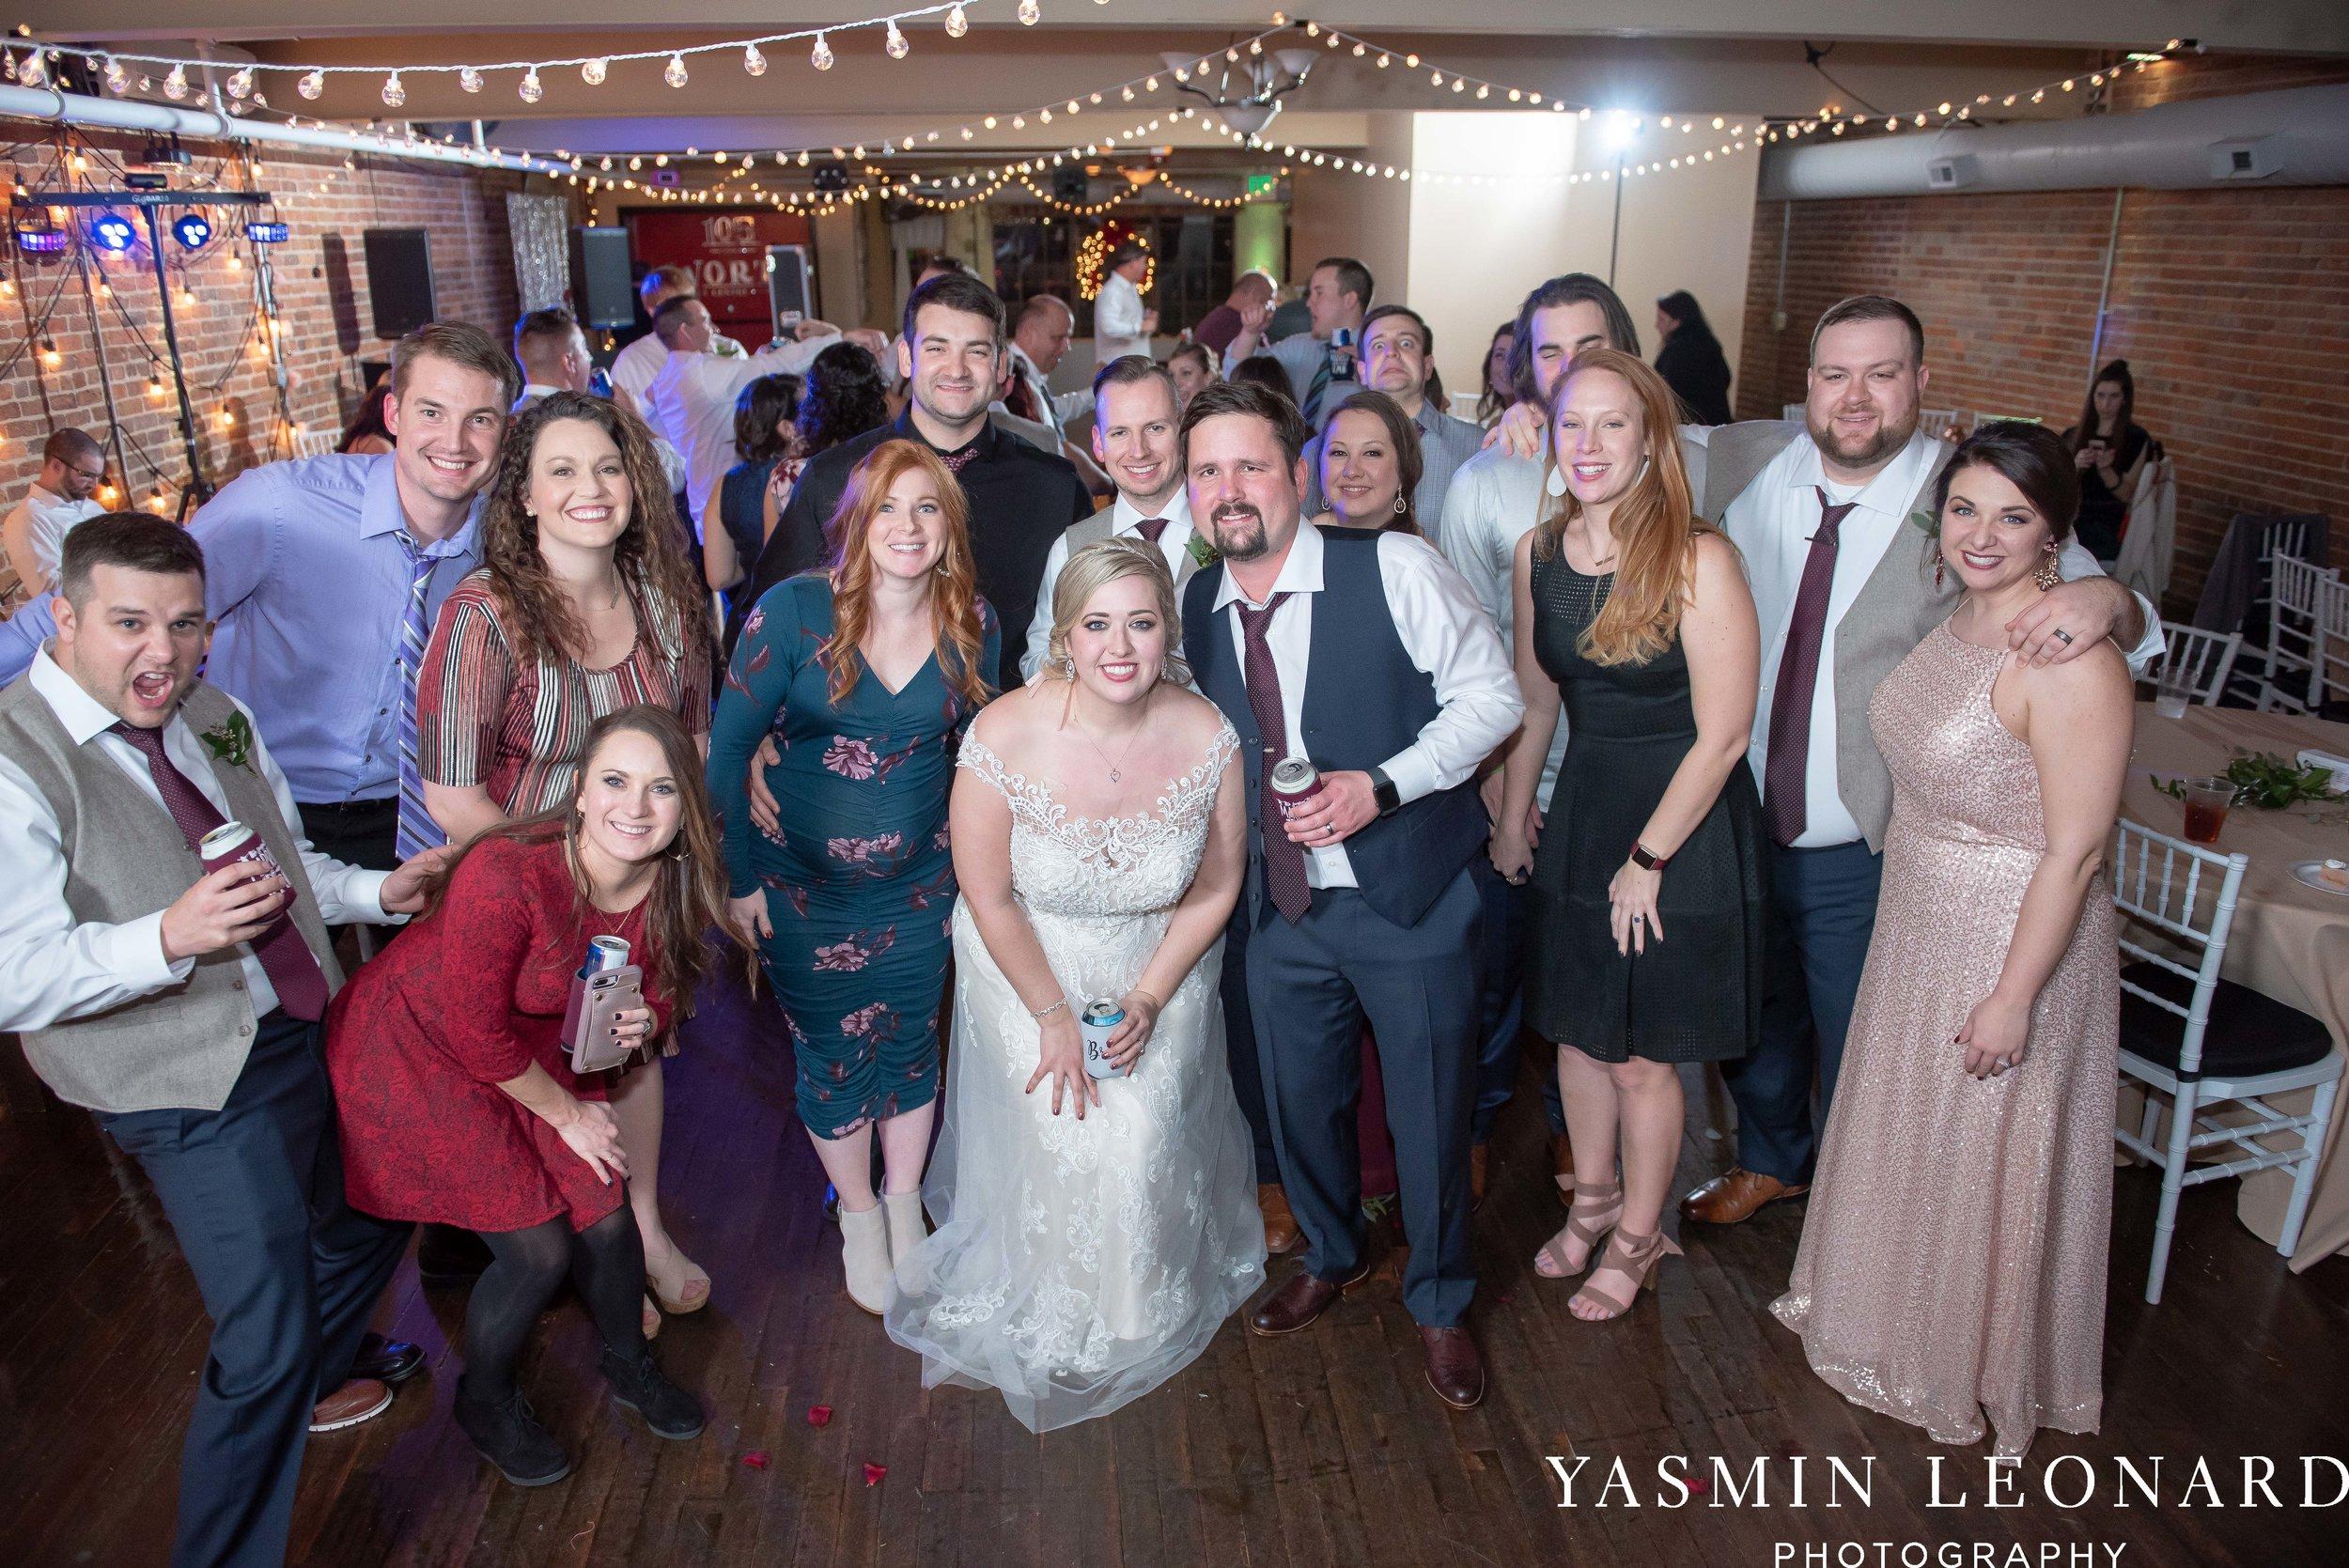 Rebekah and Matt - 105 Worth Event Centre - Yasmin Leonard Photography - Asheboro Wedding - NC Wedding - High Point Weddings - Triad Weddings - Winter Wedding-85.jpg